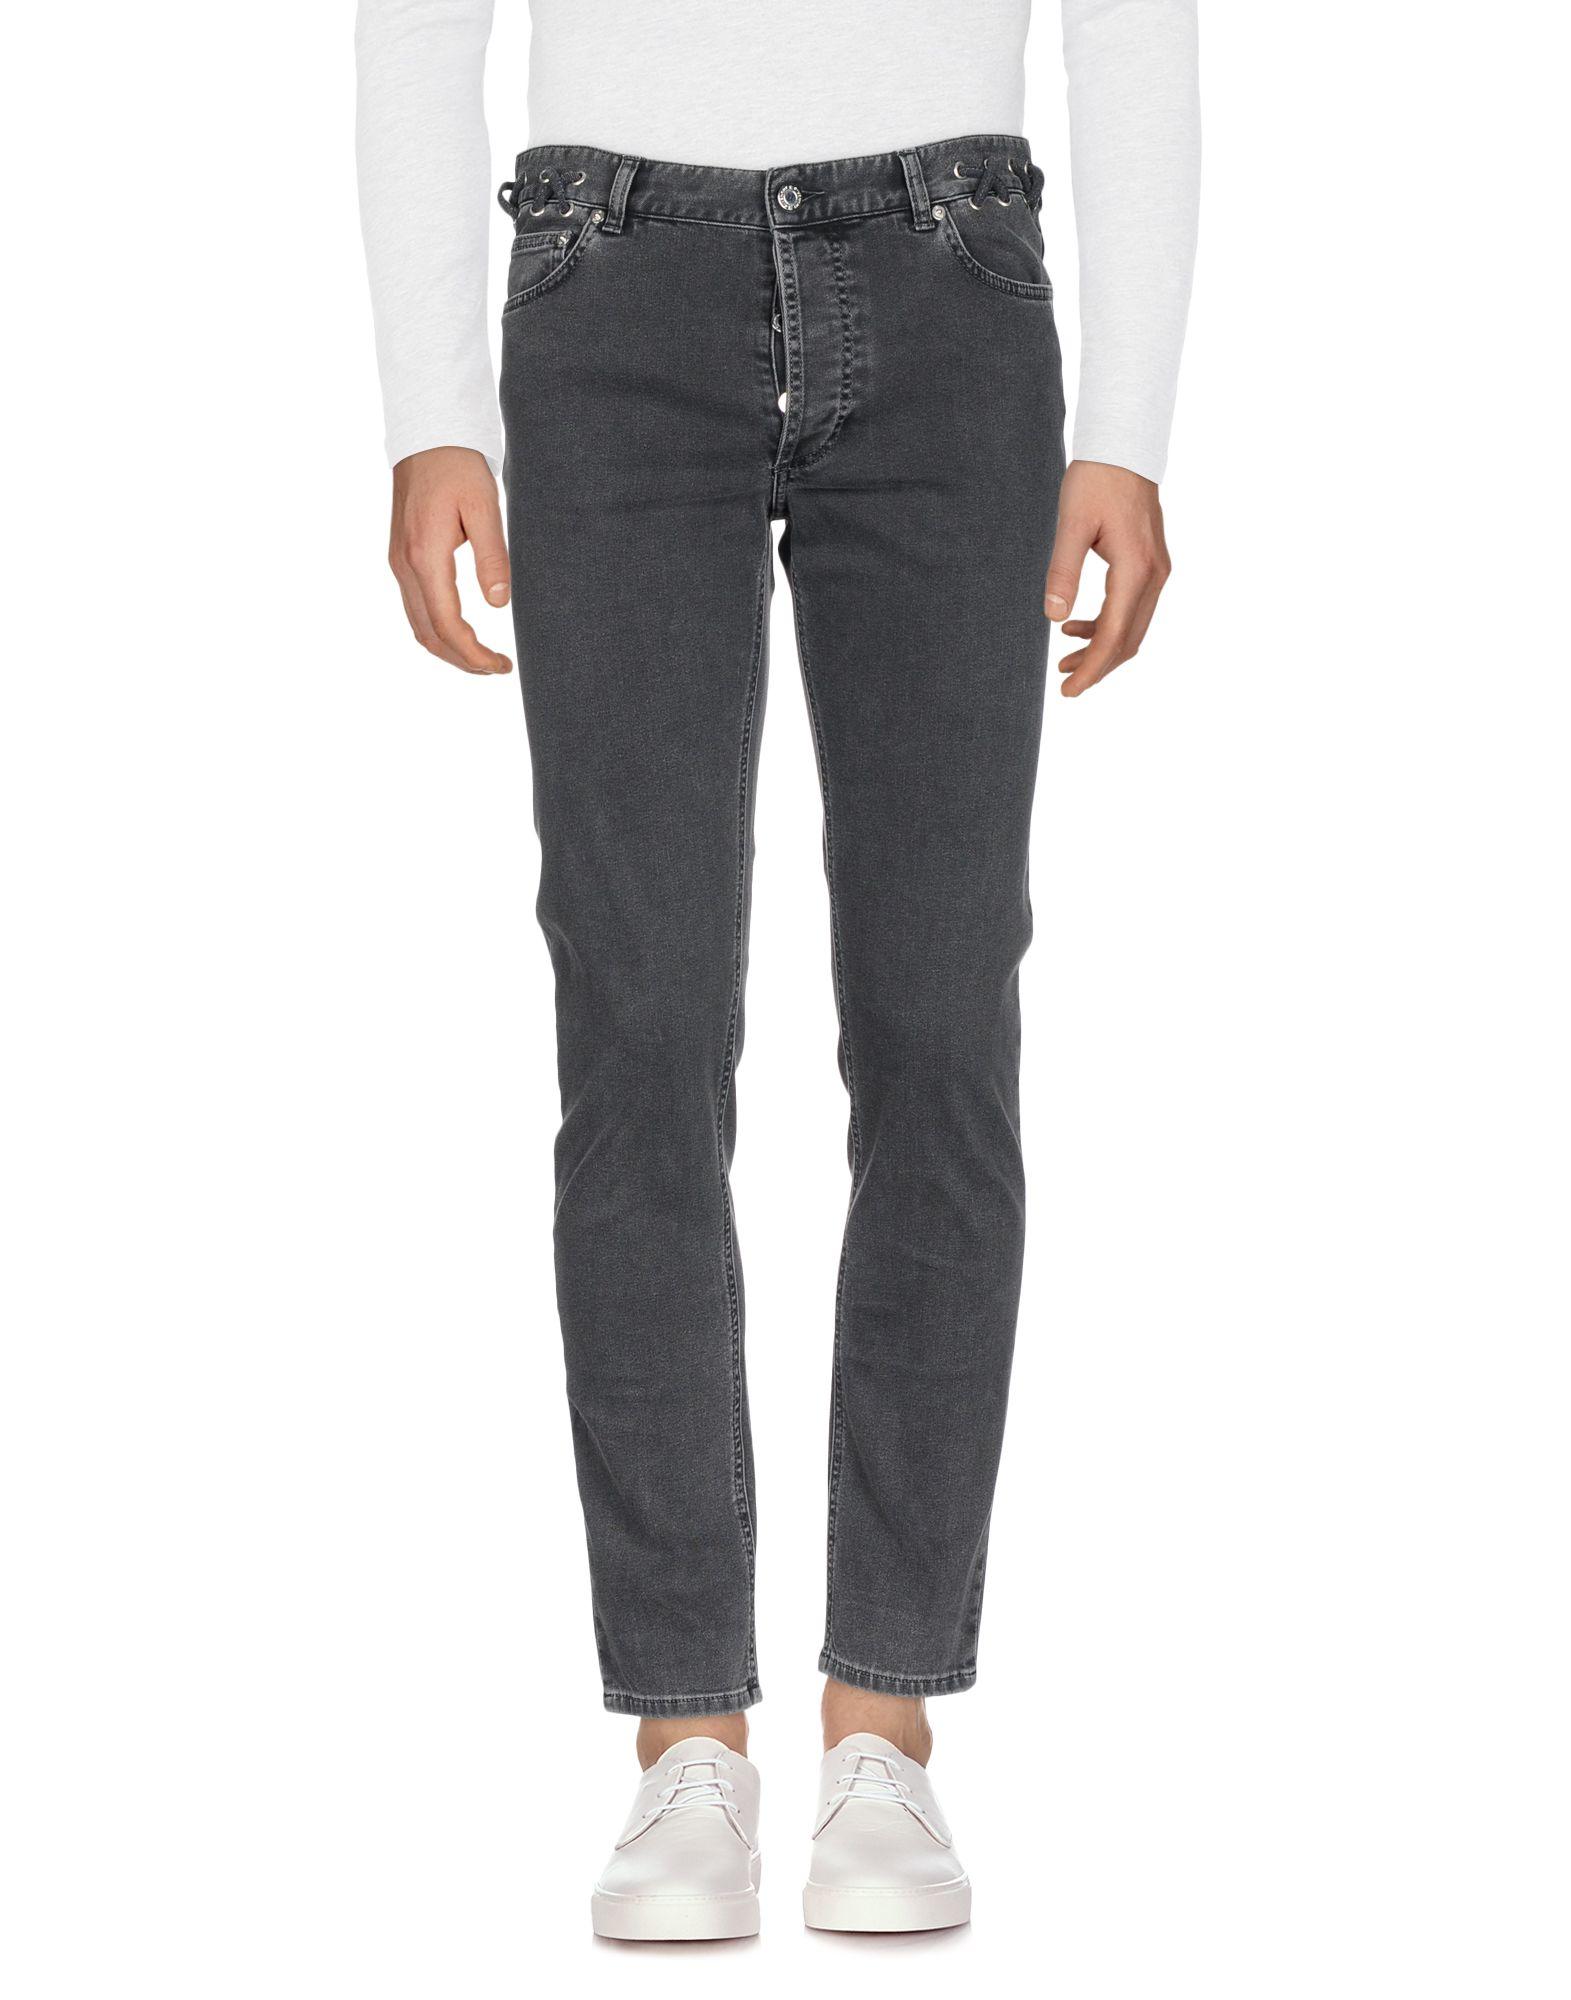 Pantaloni Jeans Givenchy Donna - Acquista online su